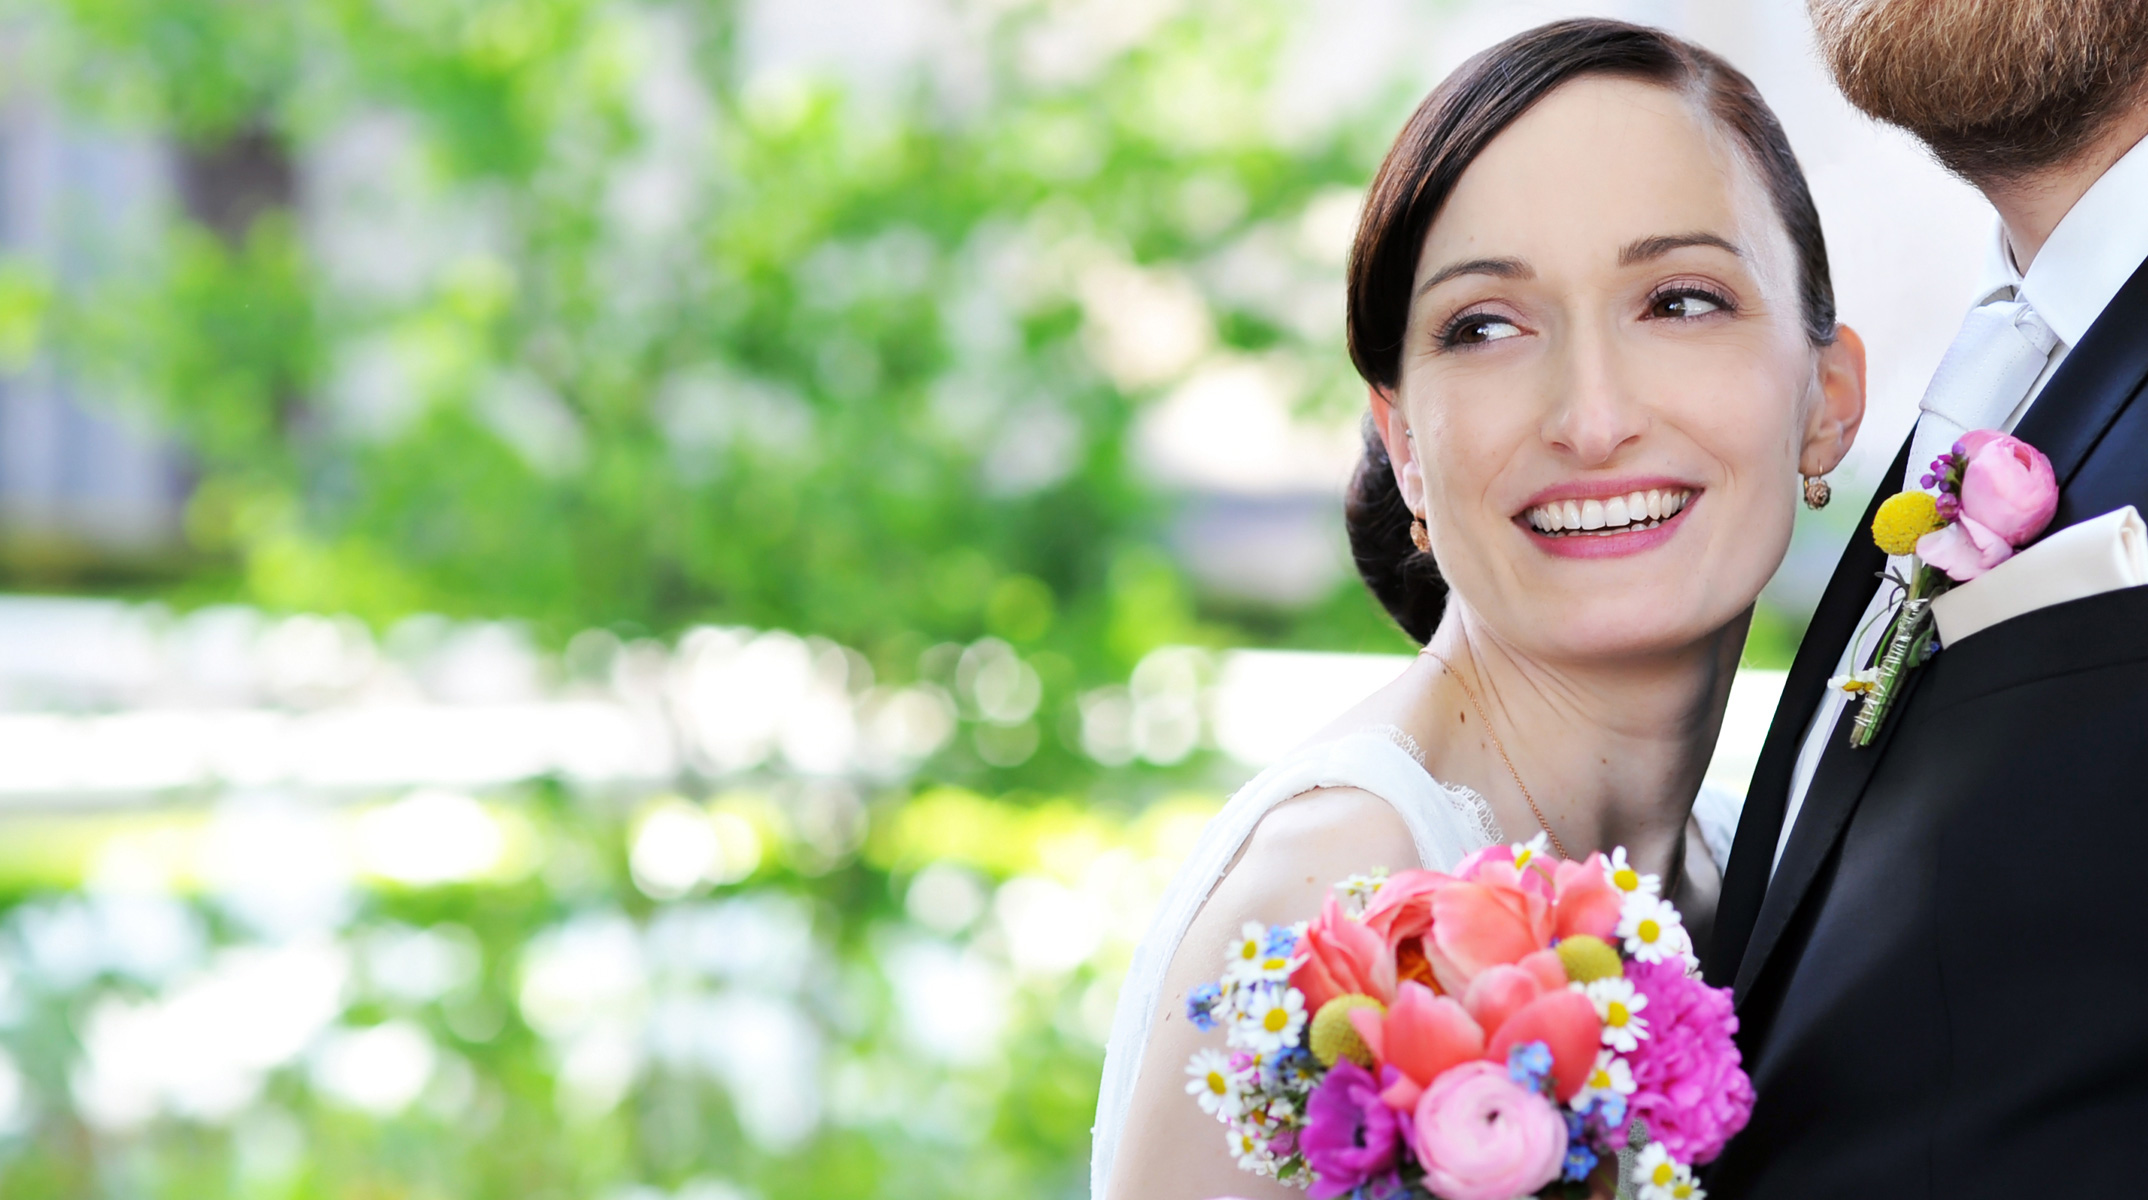 Hochzeitsfotografie-Nicole-Bouillon_Nicole-Bouillon-Fotografie30.jpg